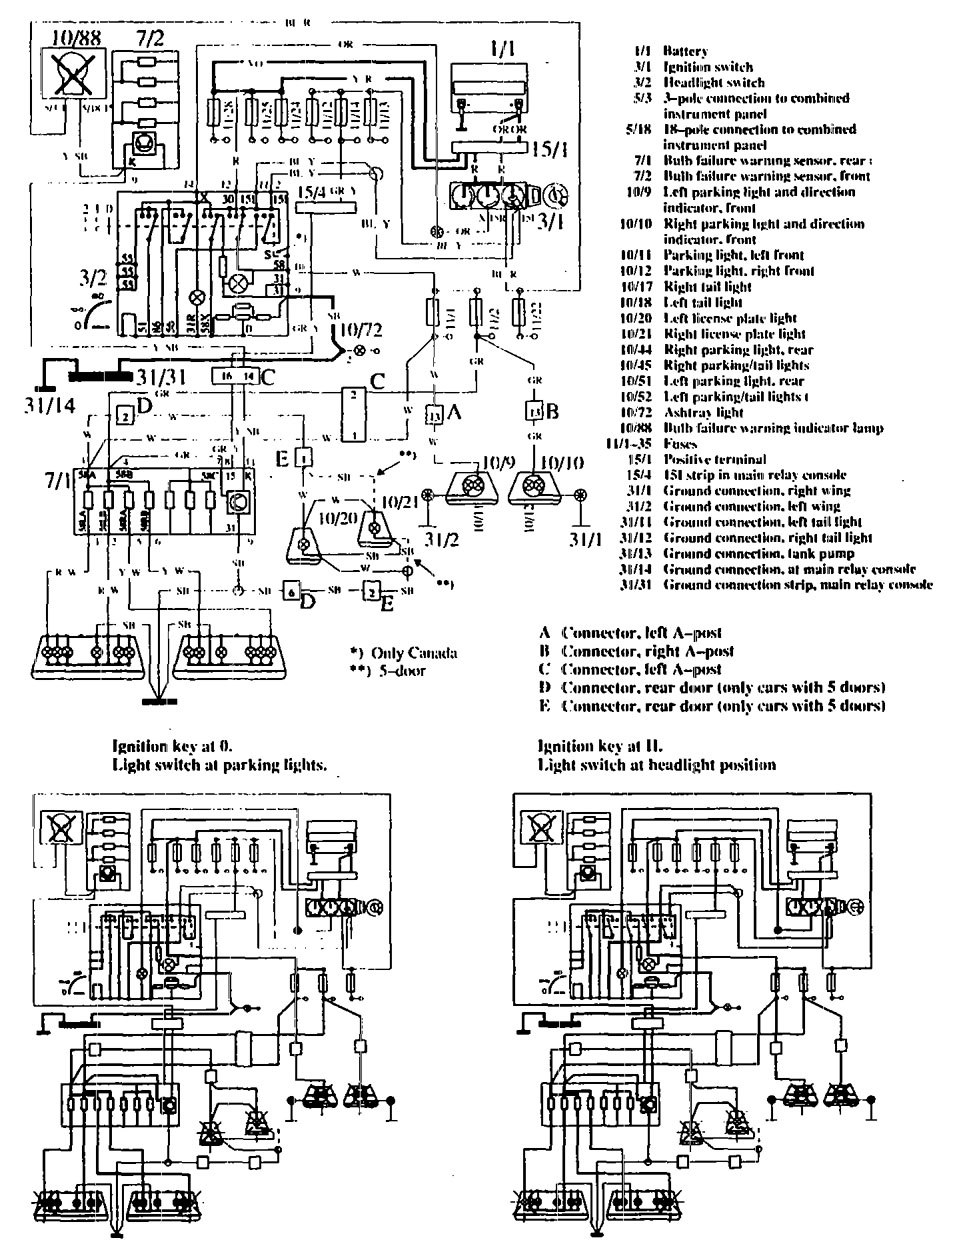 fuse box diagram 1990 volvo 760 on volvo wiring diagrams 1990 760